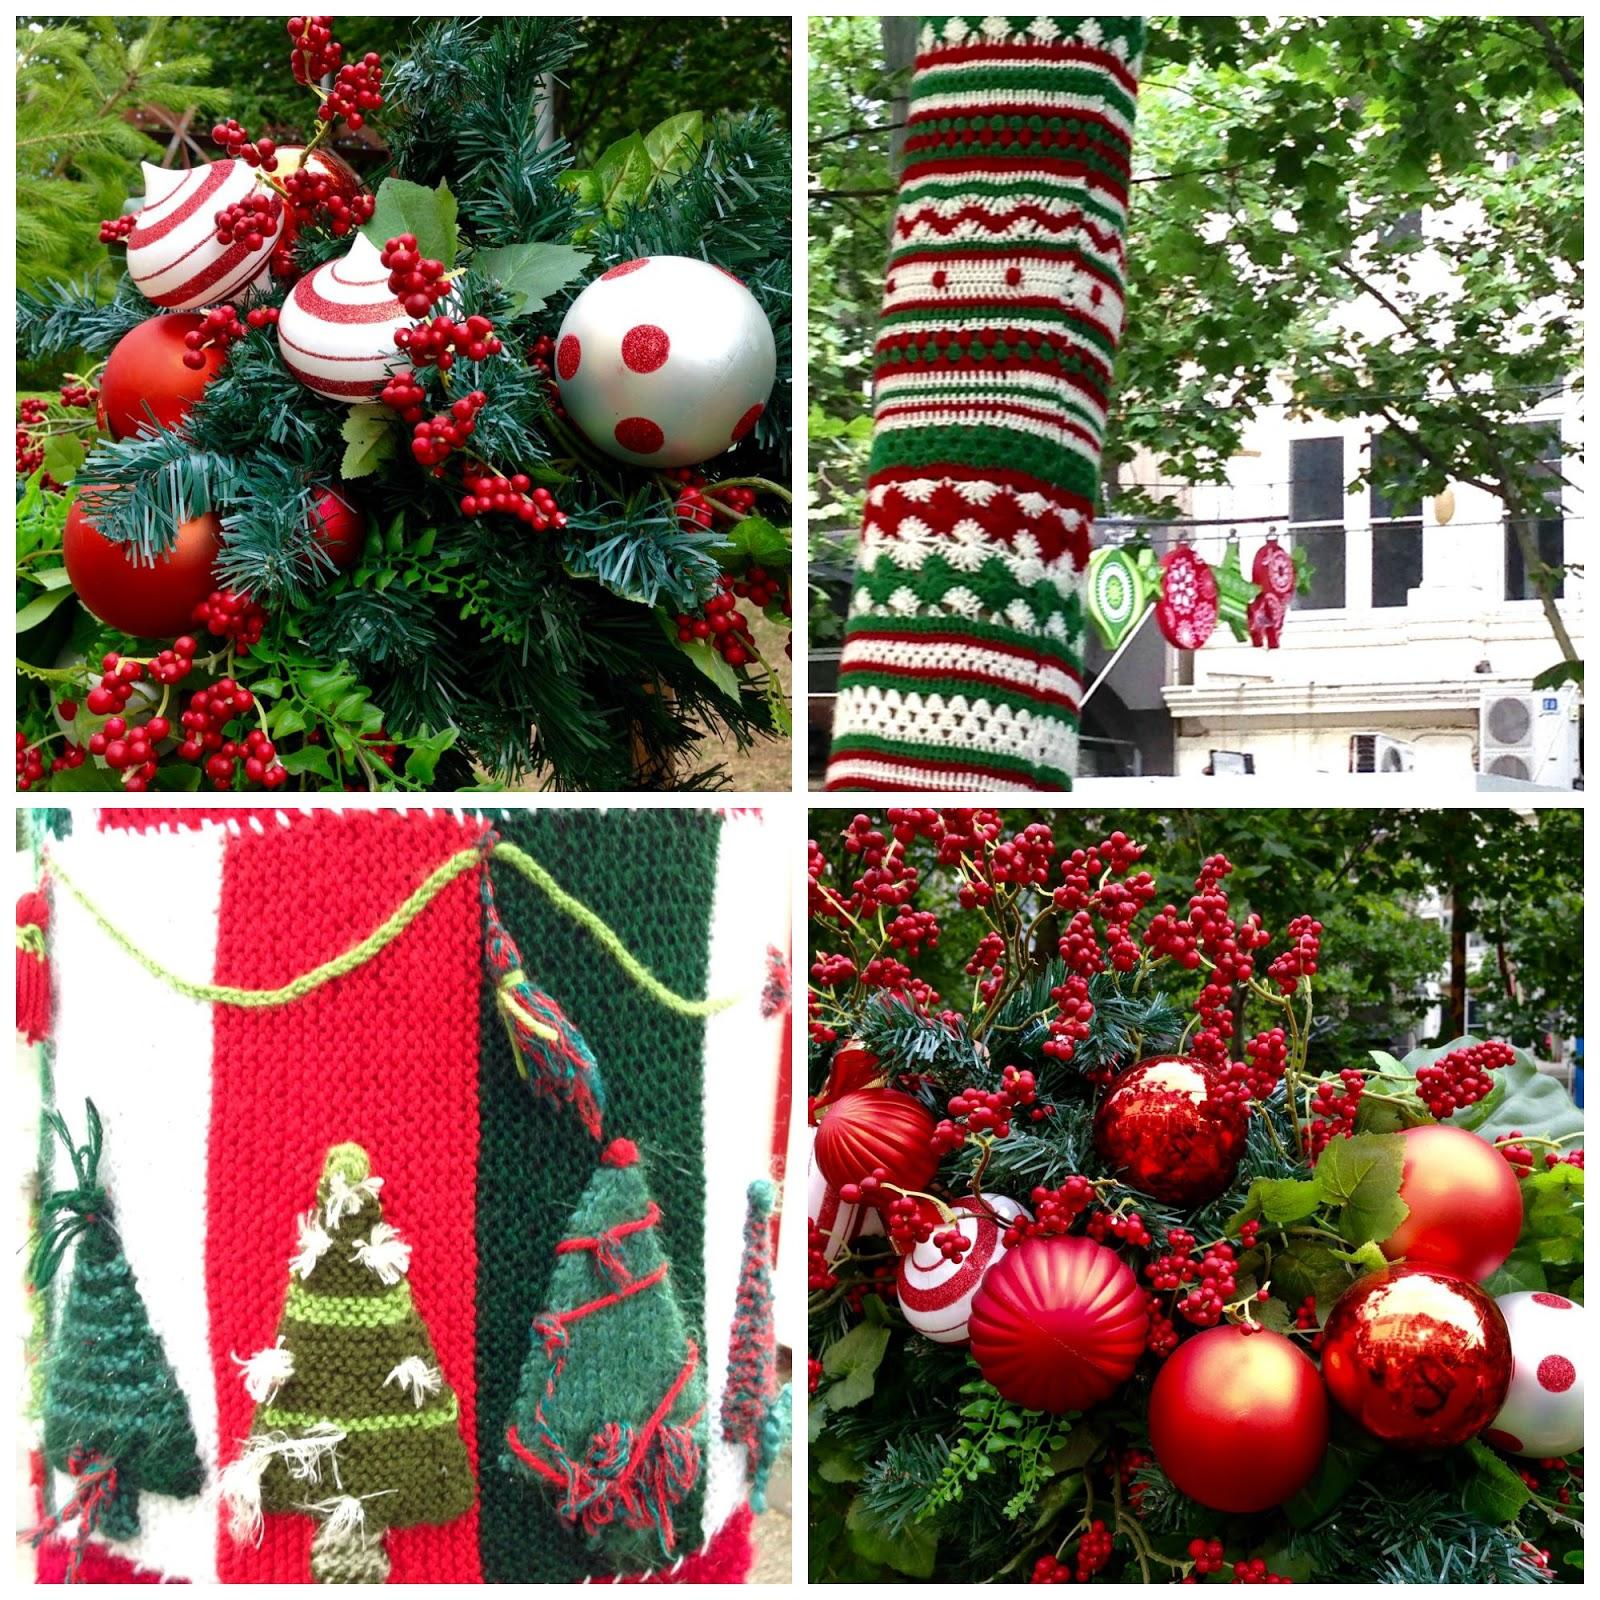 Christmas Trees Melbourne: Green Gourmet Giraffe: Melbourne Christmas: Myer Windows